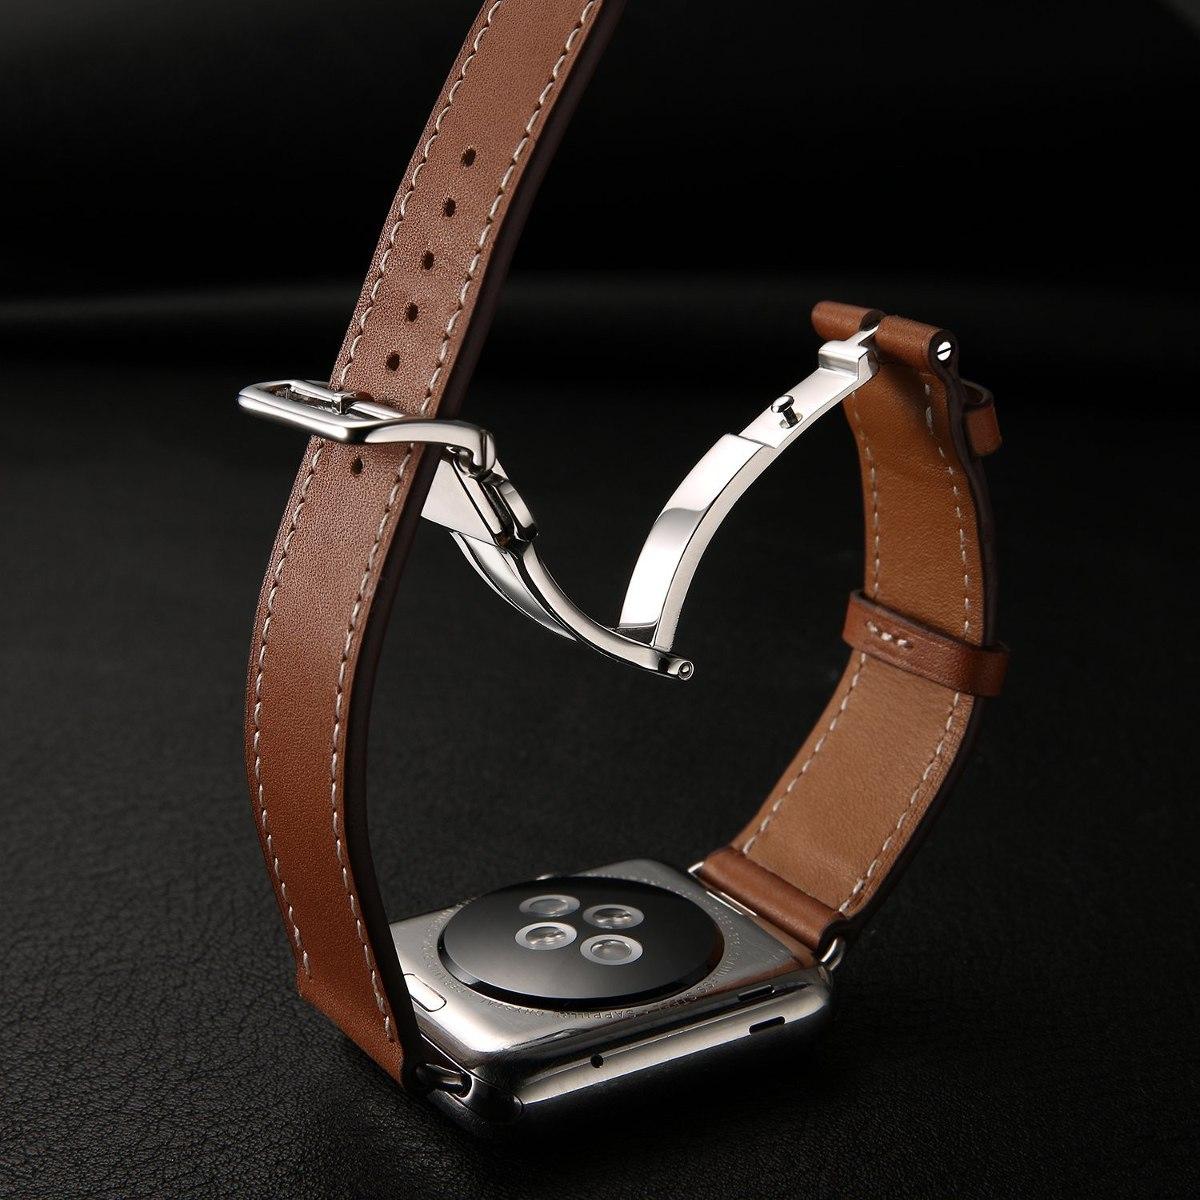 b96940f473c pulseira apple watch couro legitimo tour hermès 42mm 44mm. Carregando zoom.